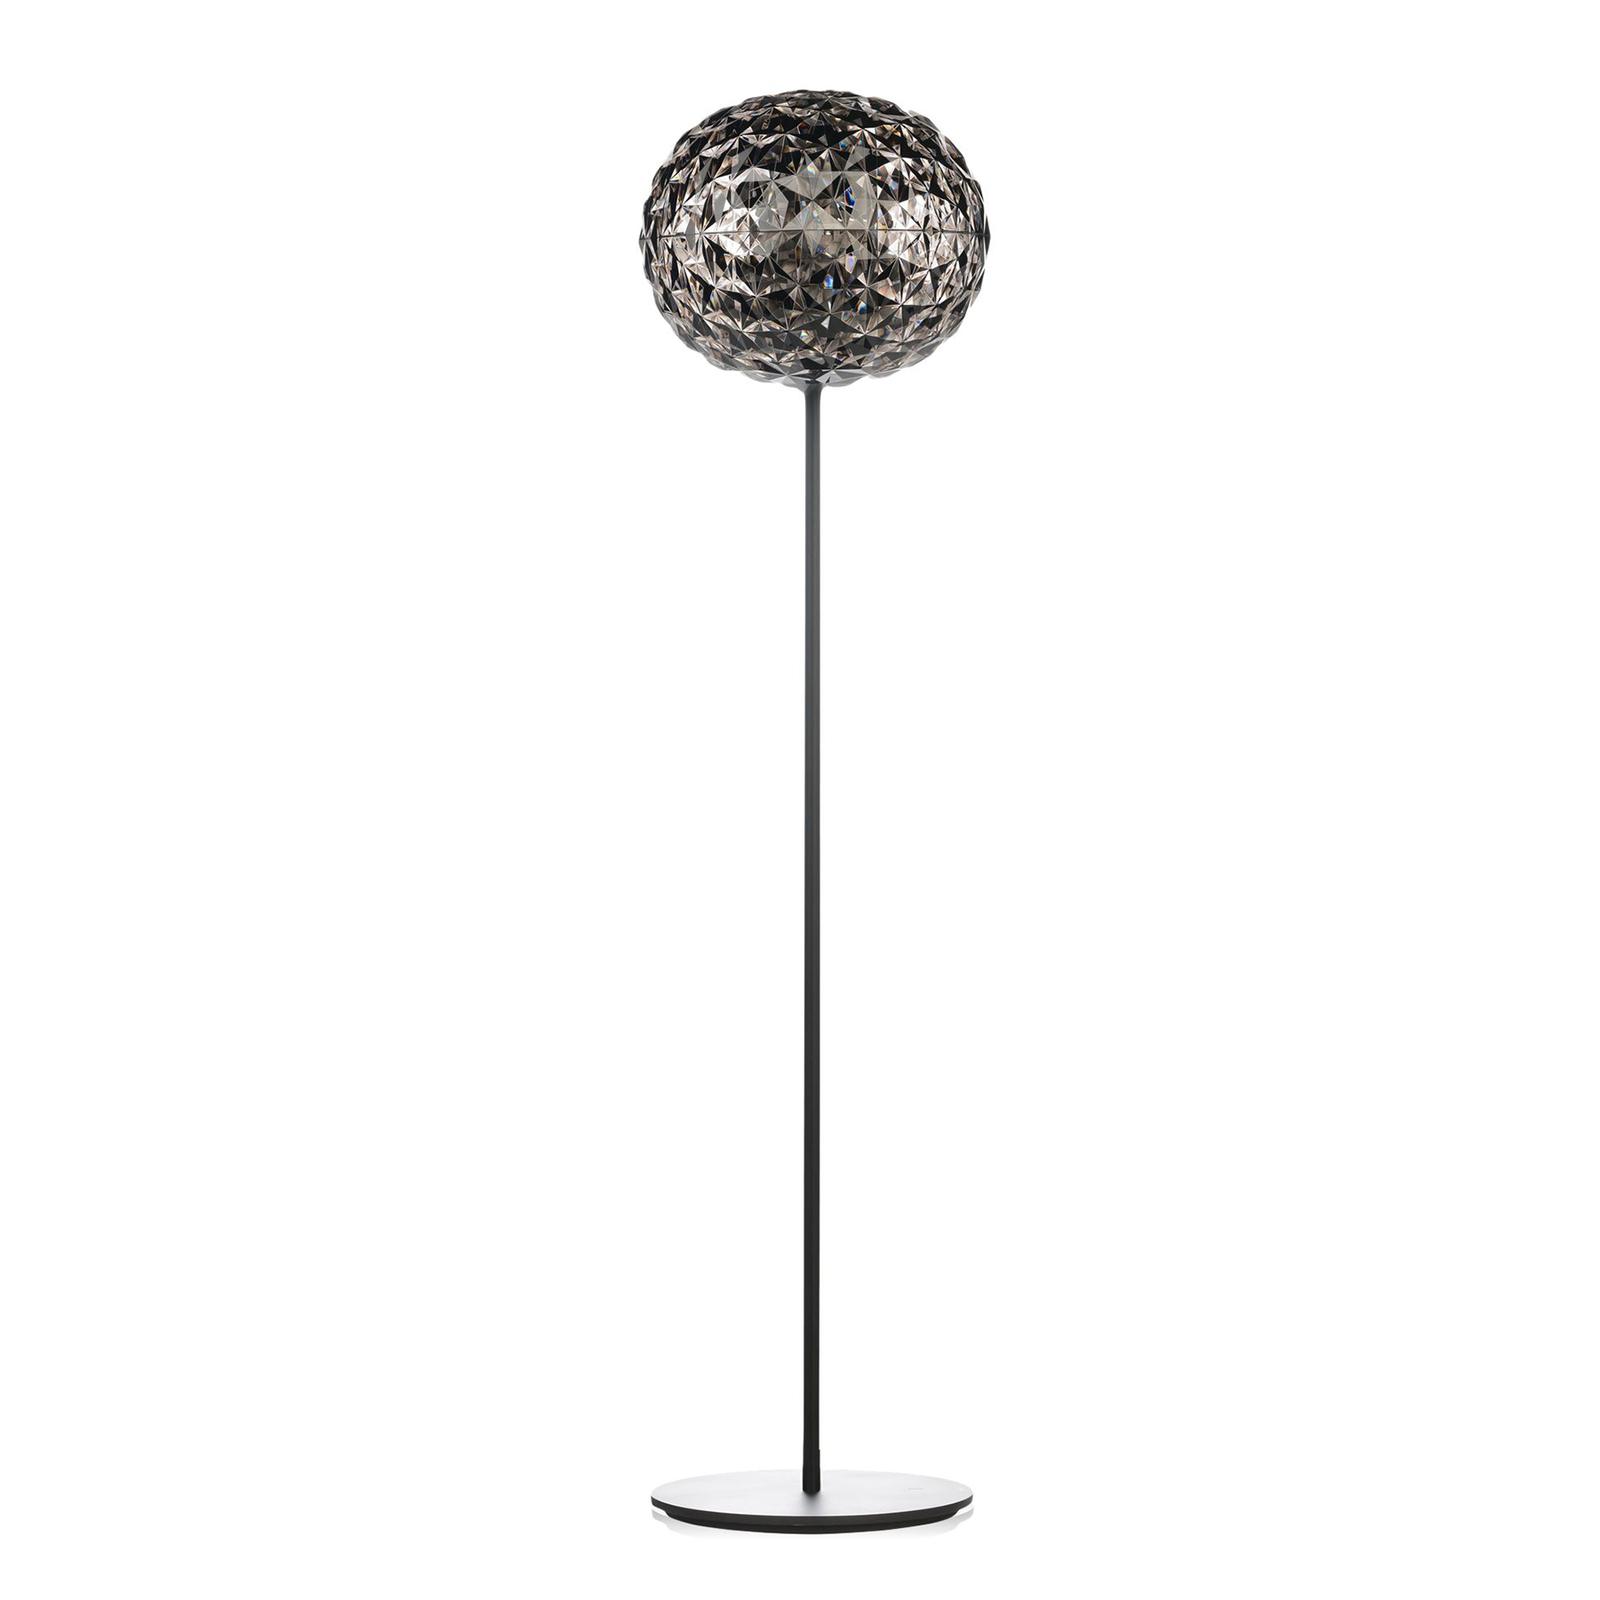 Kartell Planet LED-Stehleuchte 130cm rauchgrau